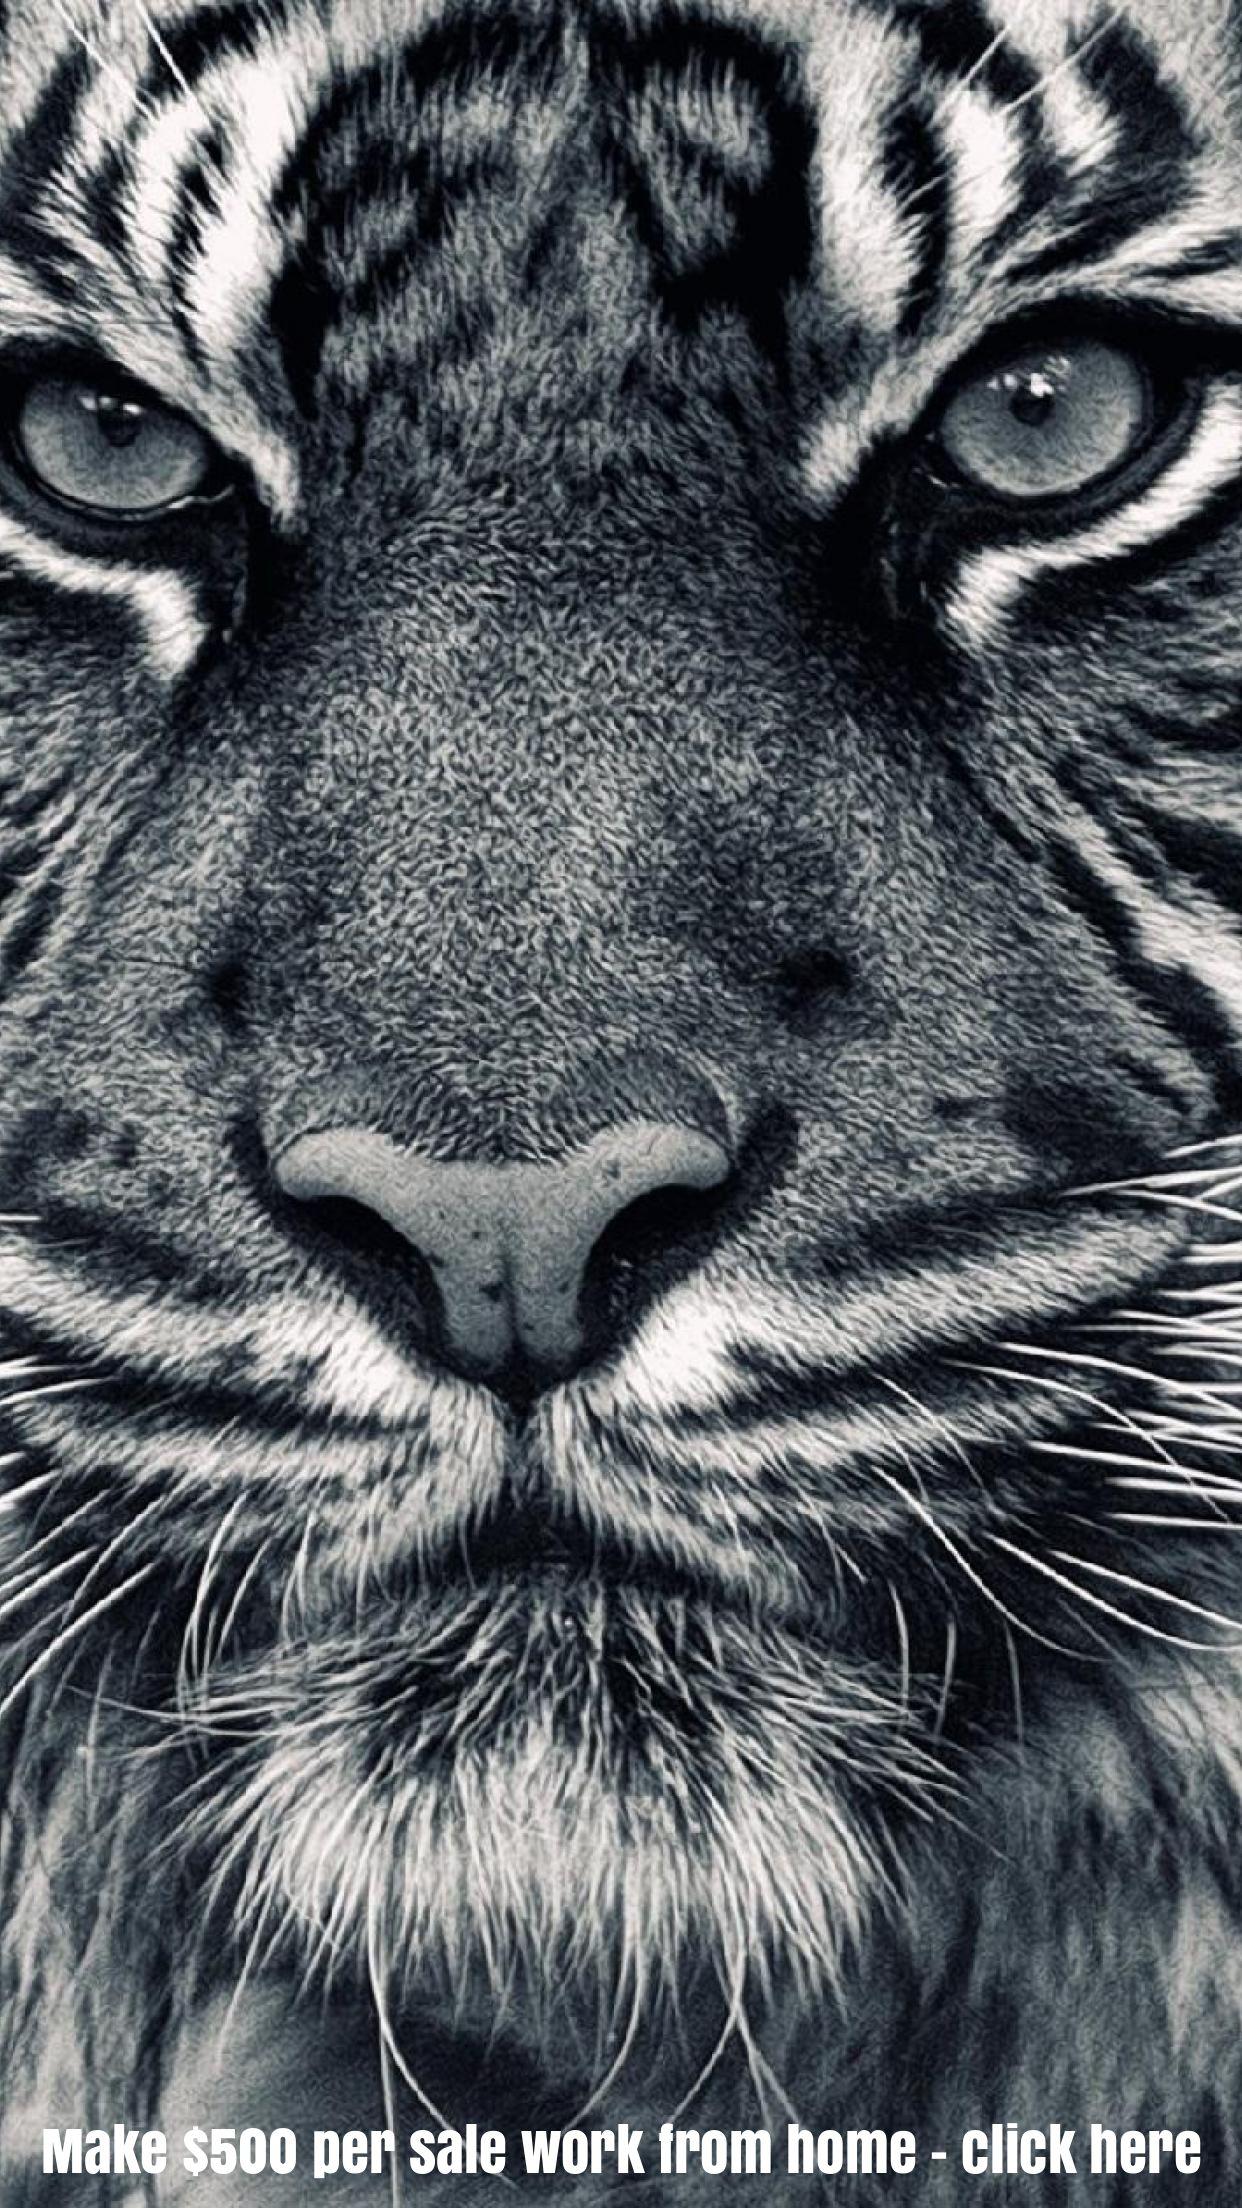 Grey Tiger iphone background wallpaper | Popular iPhone